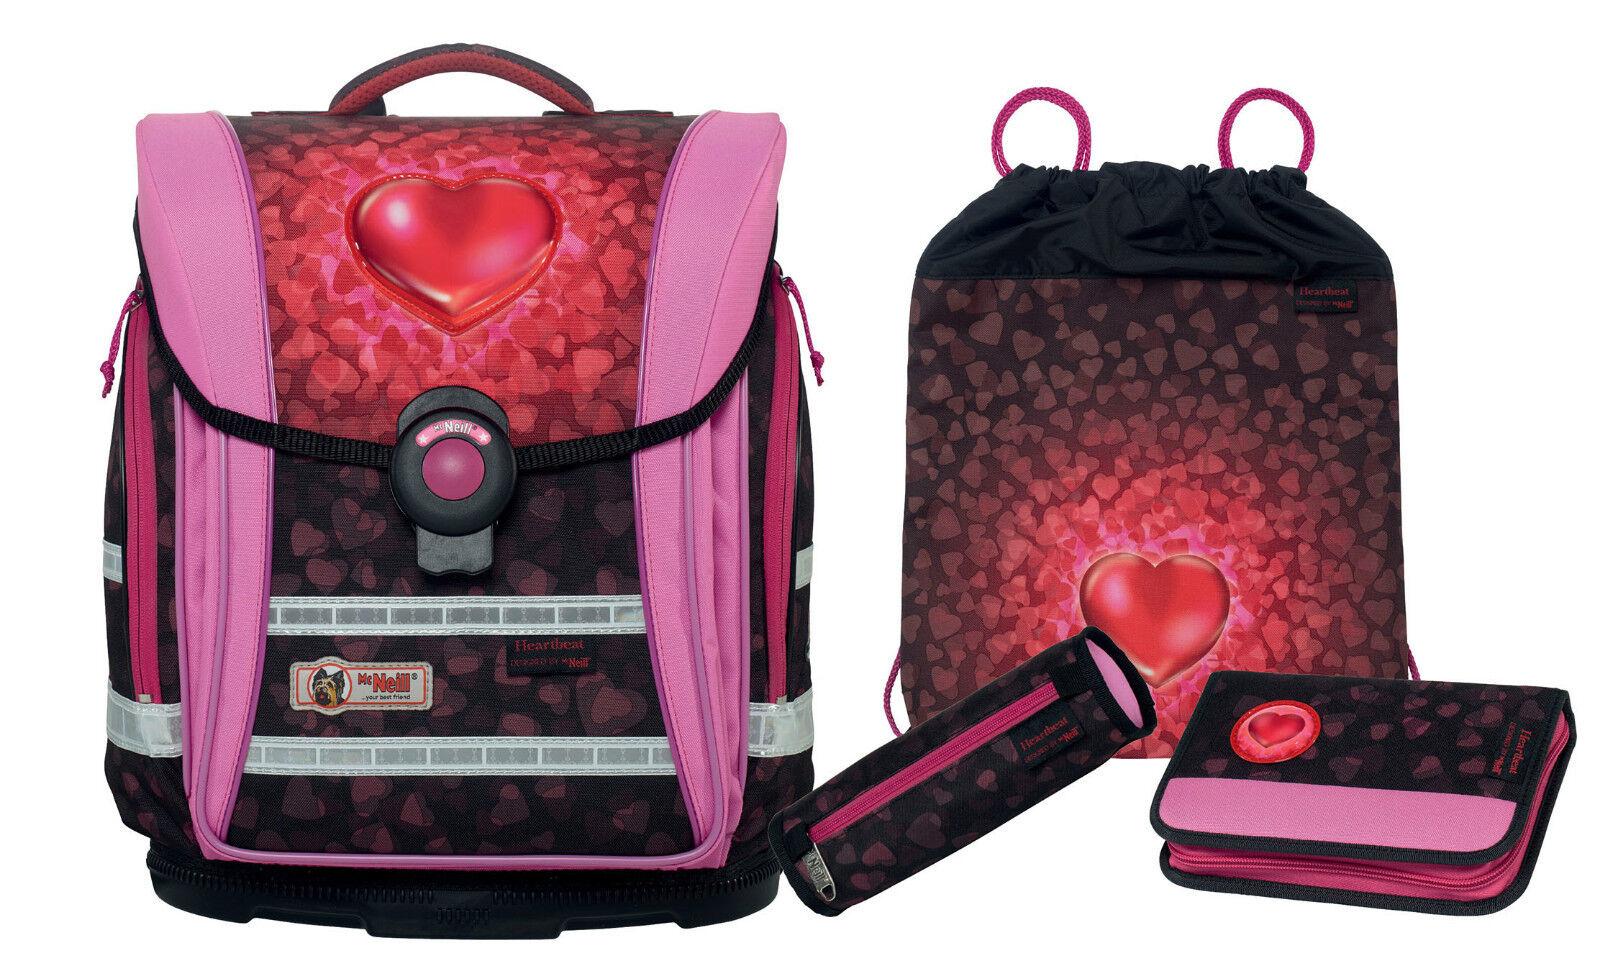 McNeill Set ERGO LIGHT COMPACT flex 4tlg HEARTBEAT Nr. 188 | Hochwertige Produkte  | Elegant  | Großer Verkauf